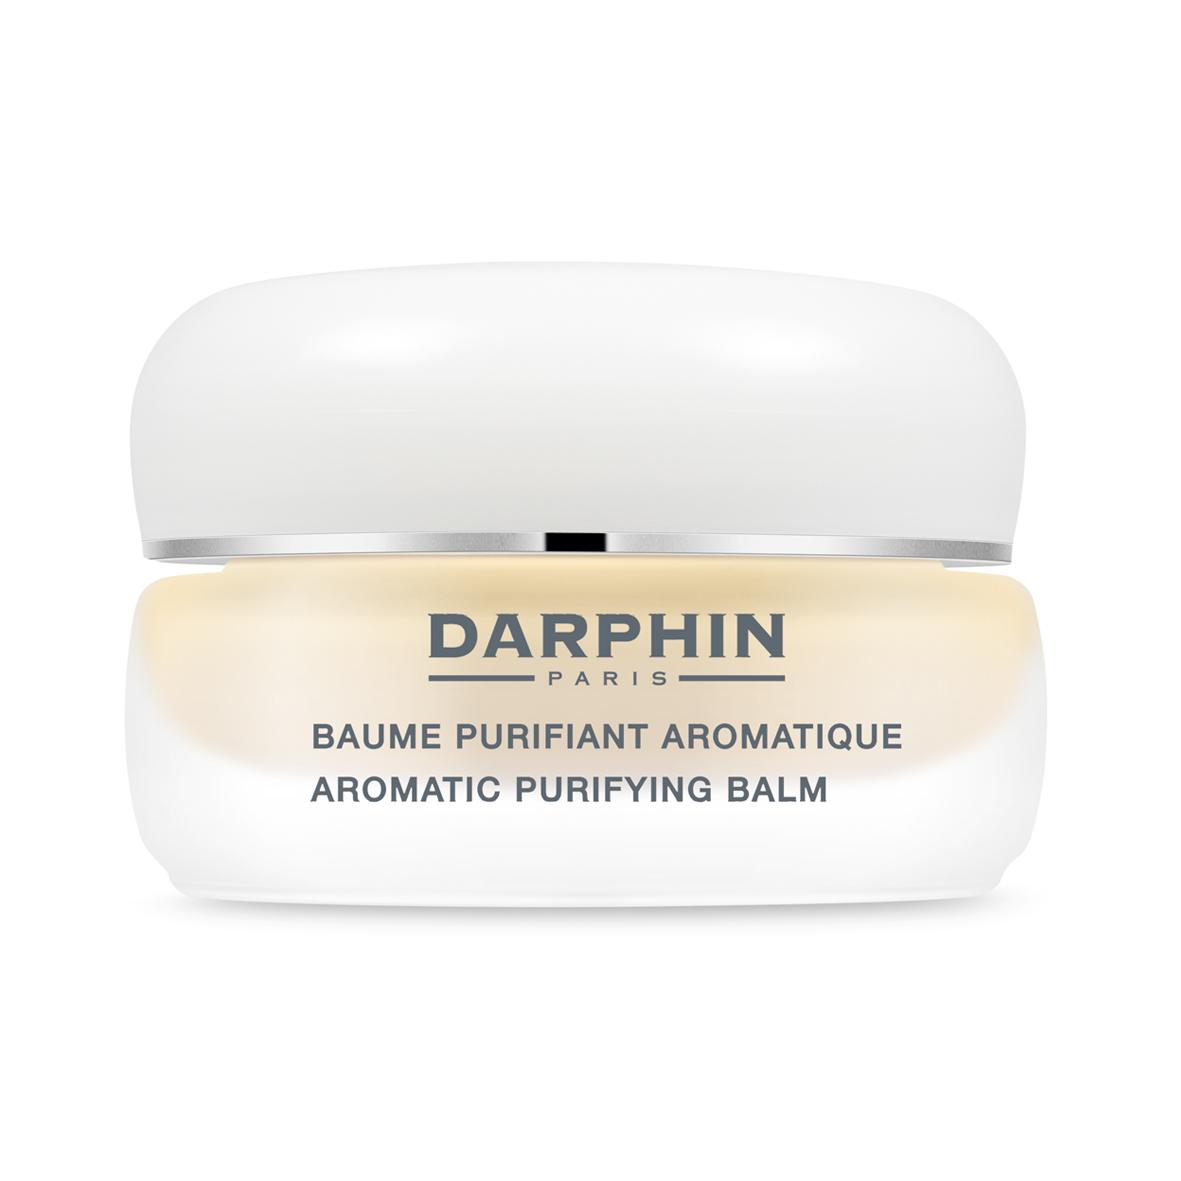 Purifying Aromatic Balm